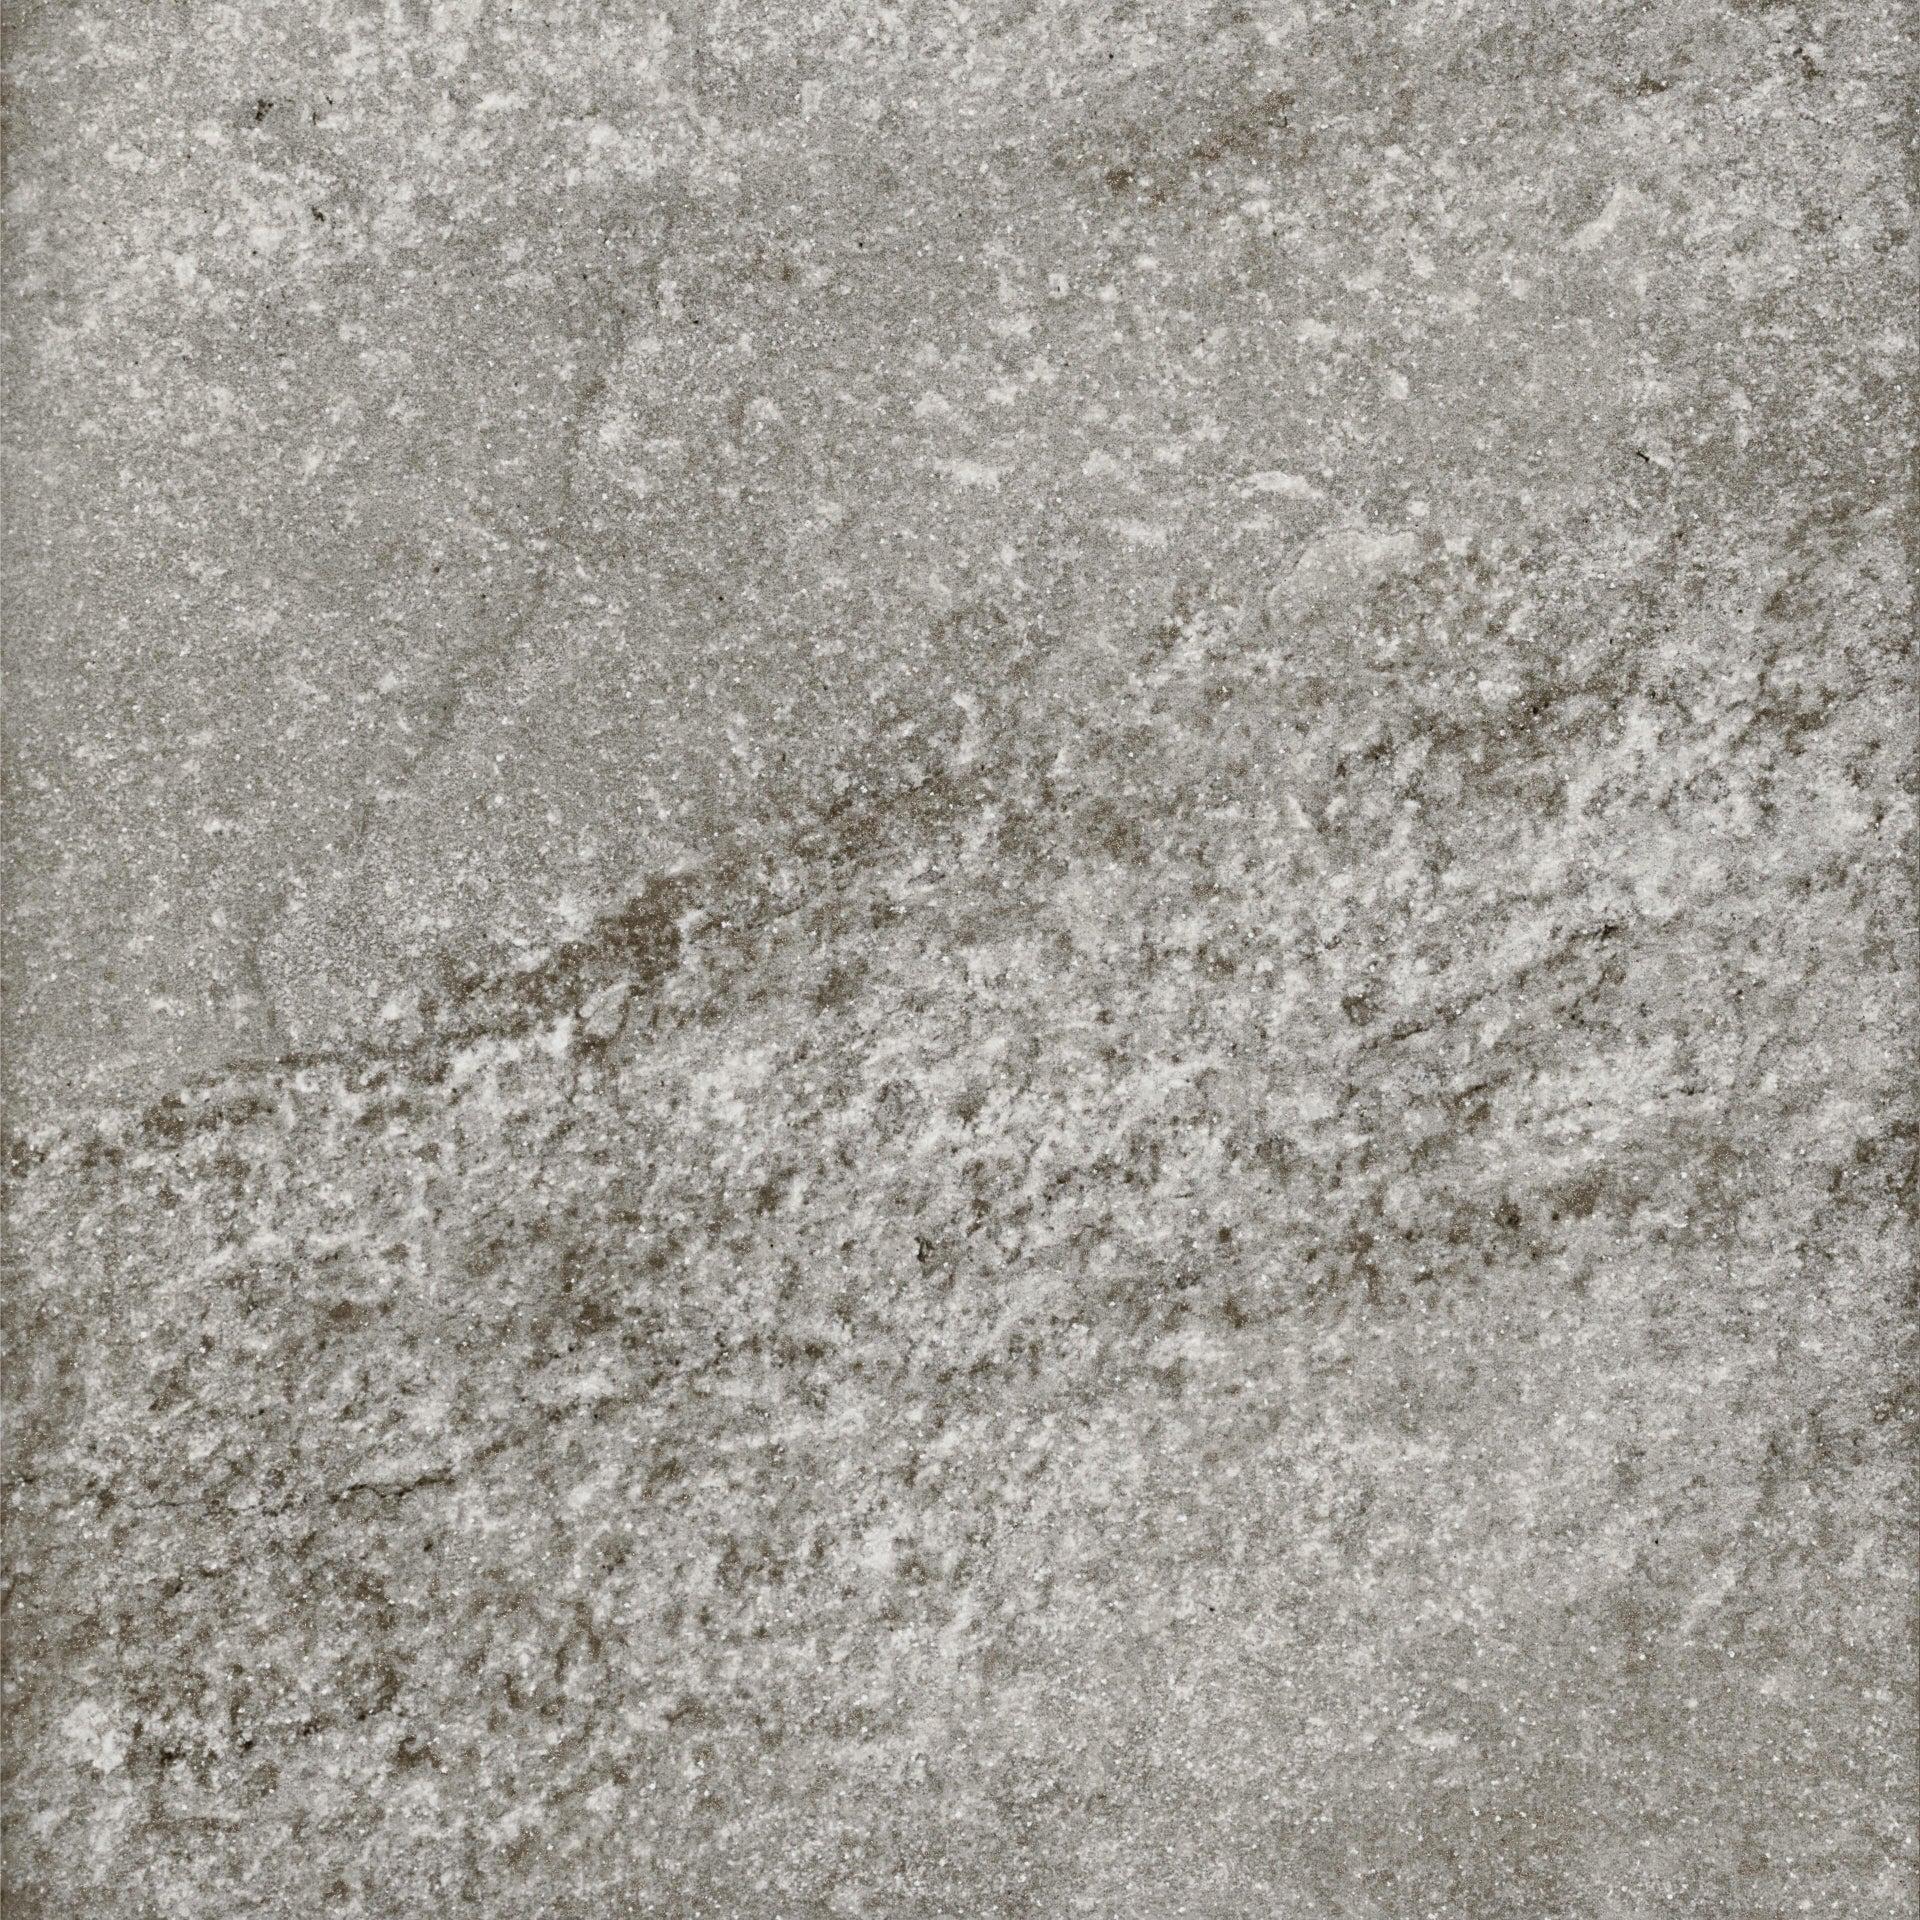 Piastrella da pavimento Walk 32.5 x 32.5 cm sp. 9 mm PEI 3/5 grigio - 4